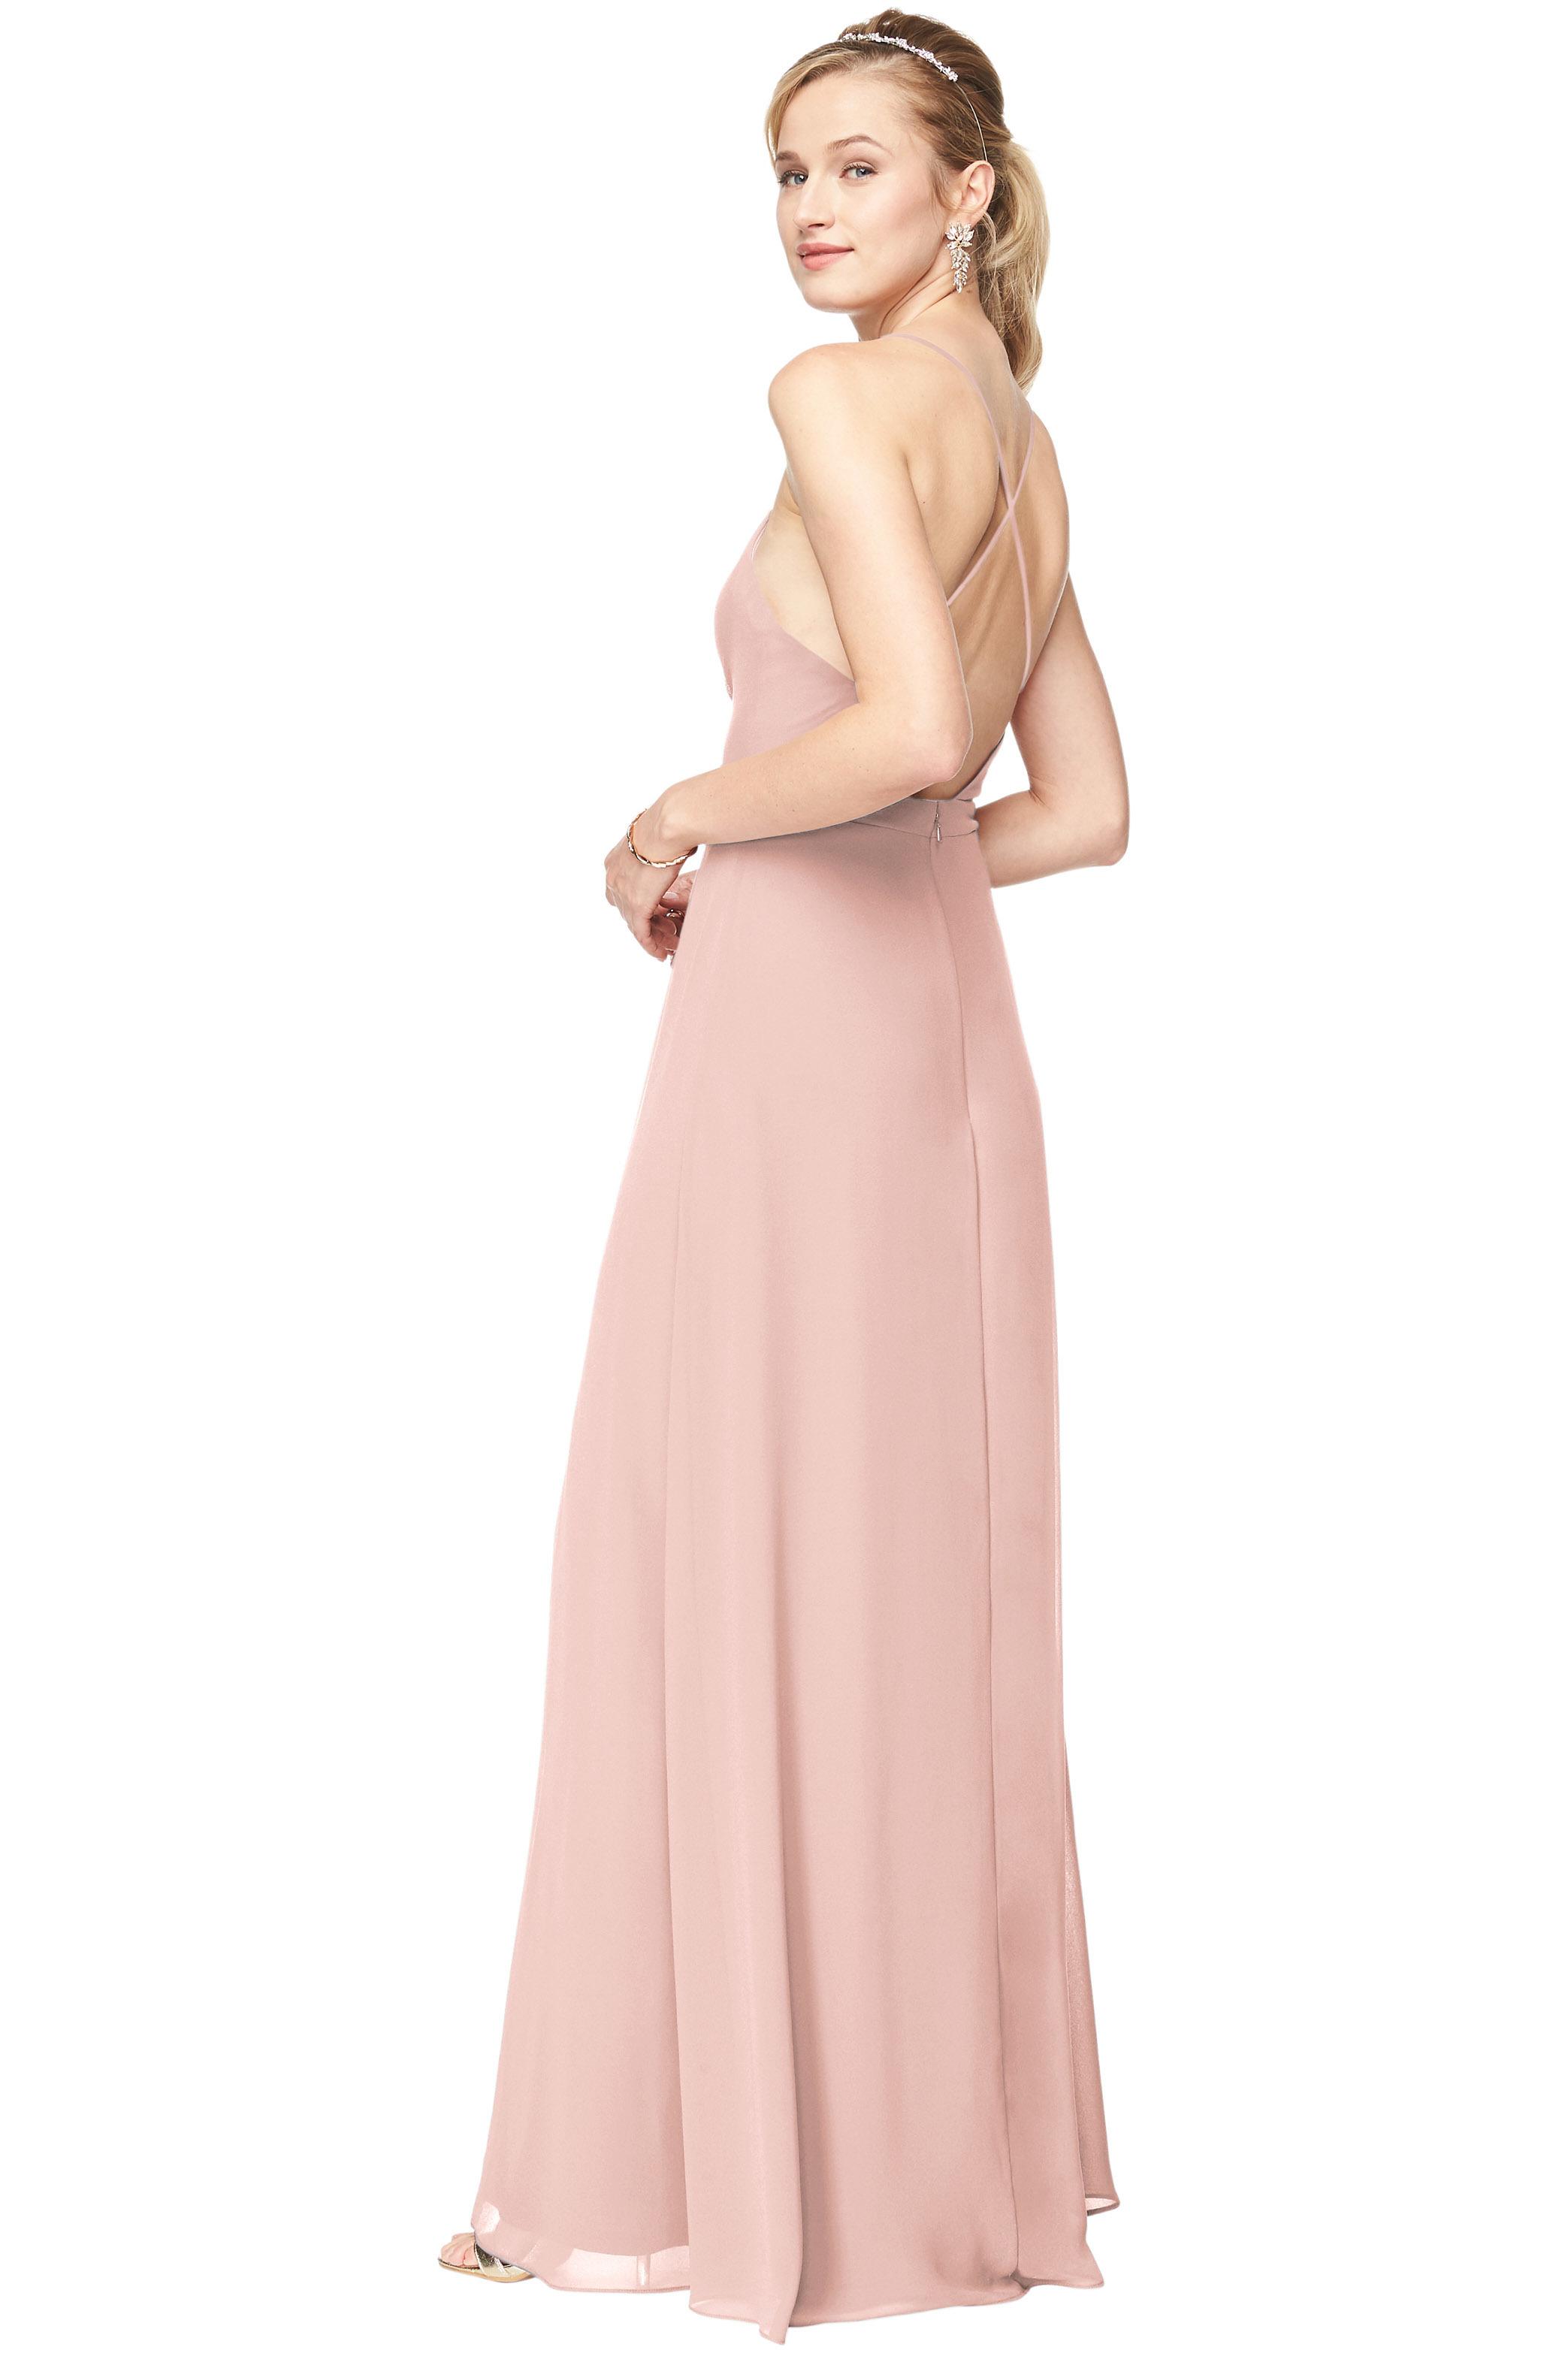 Bill Levkoff FROST ROSE Chiffon Surplice A-Line gown, $178.00 Back